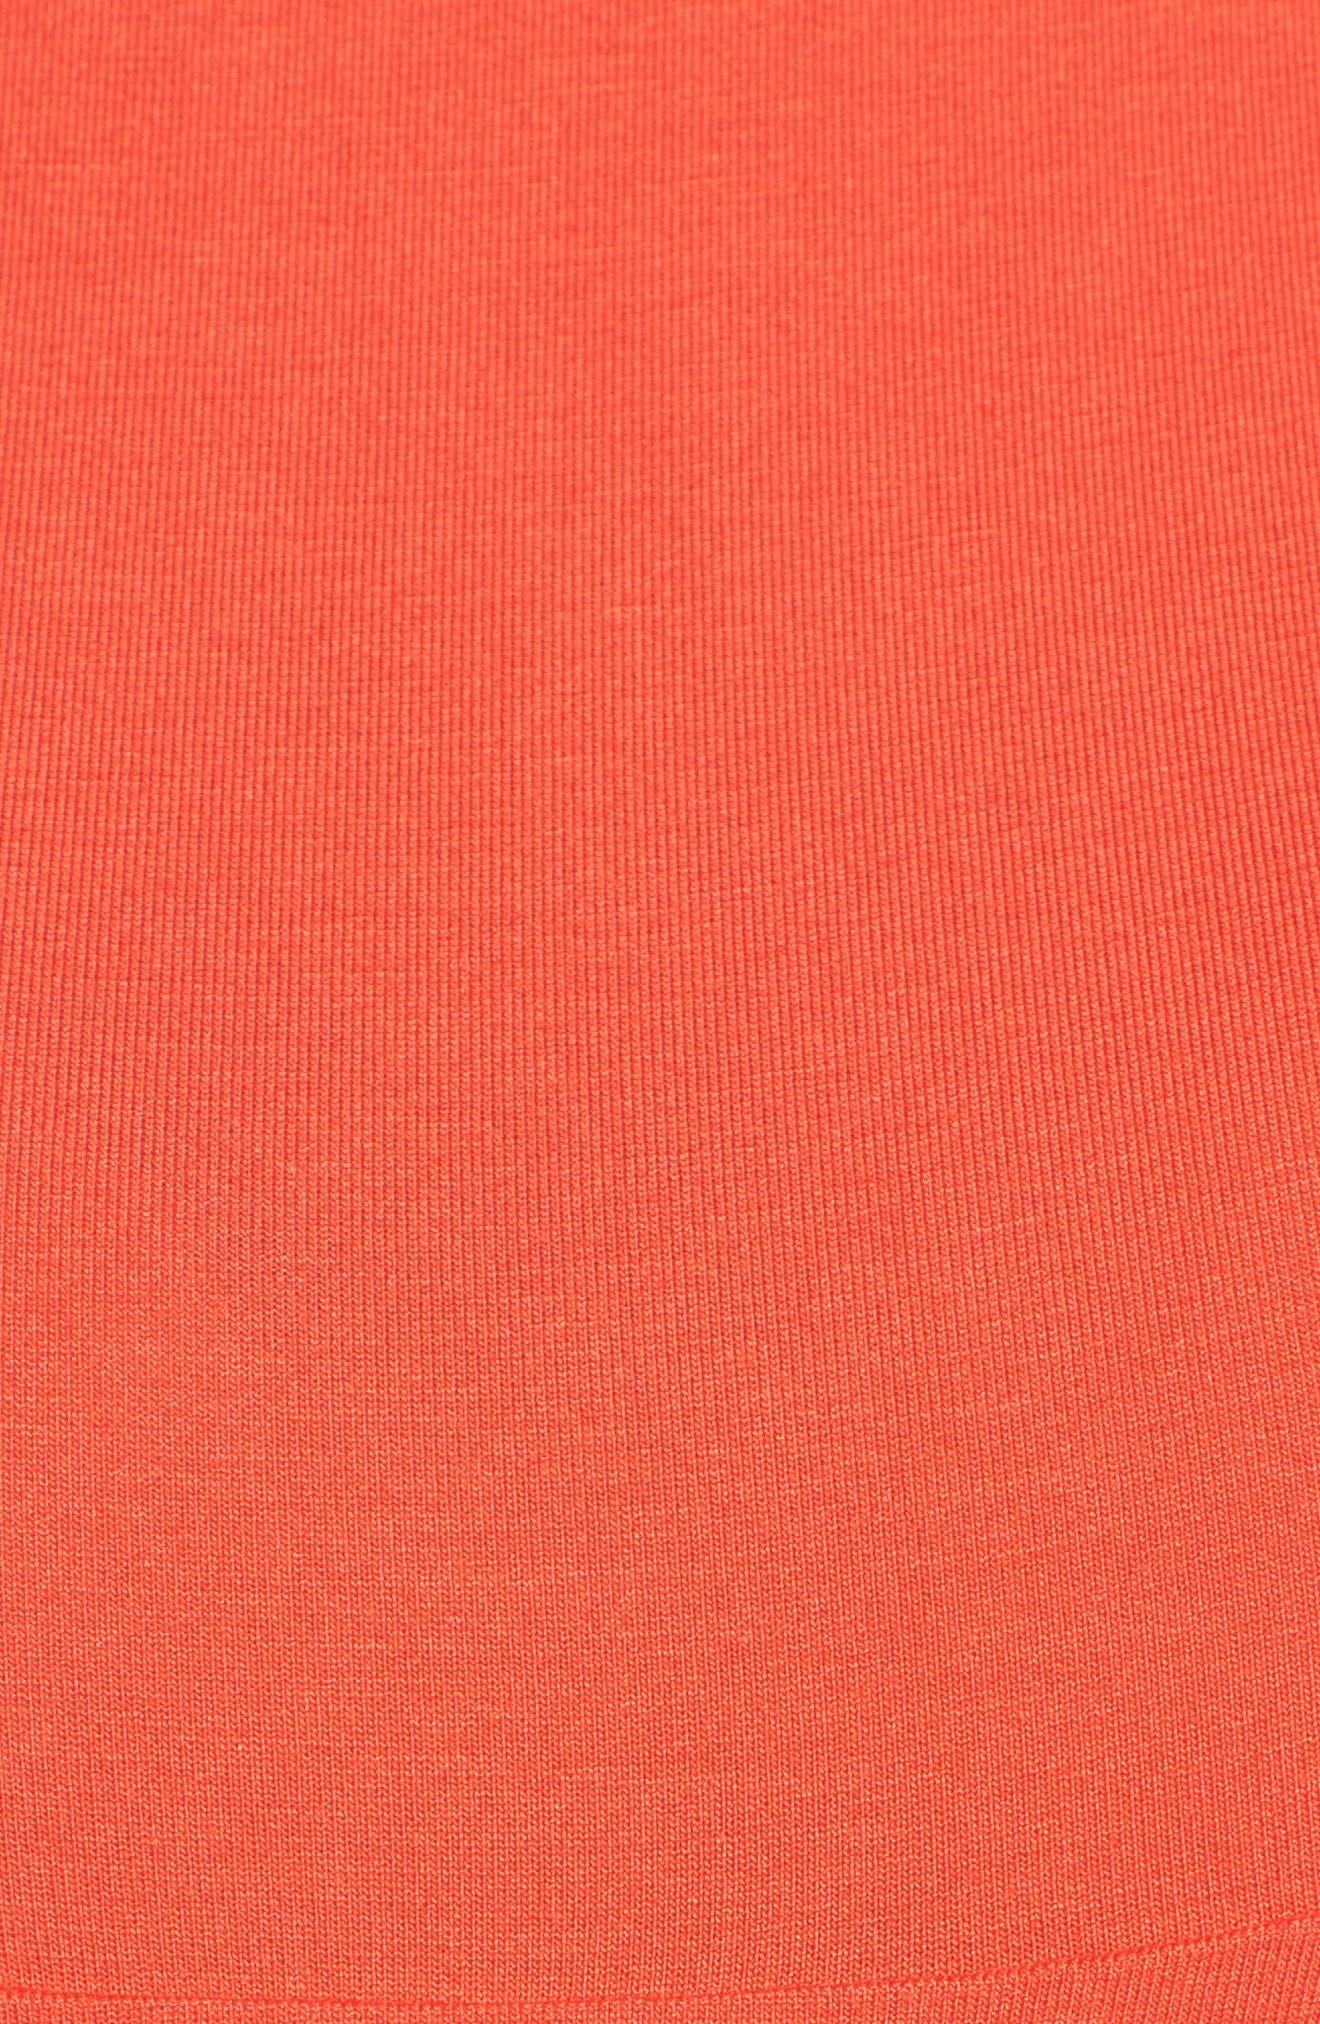 Coraline Maternity Shift Dress,                             Alternate thumbnail 5, color,                             950